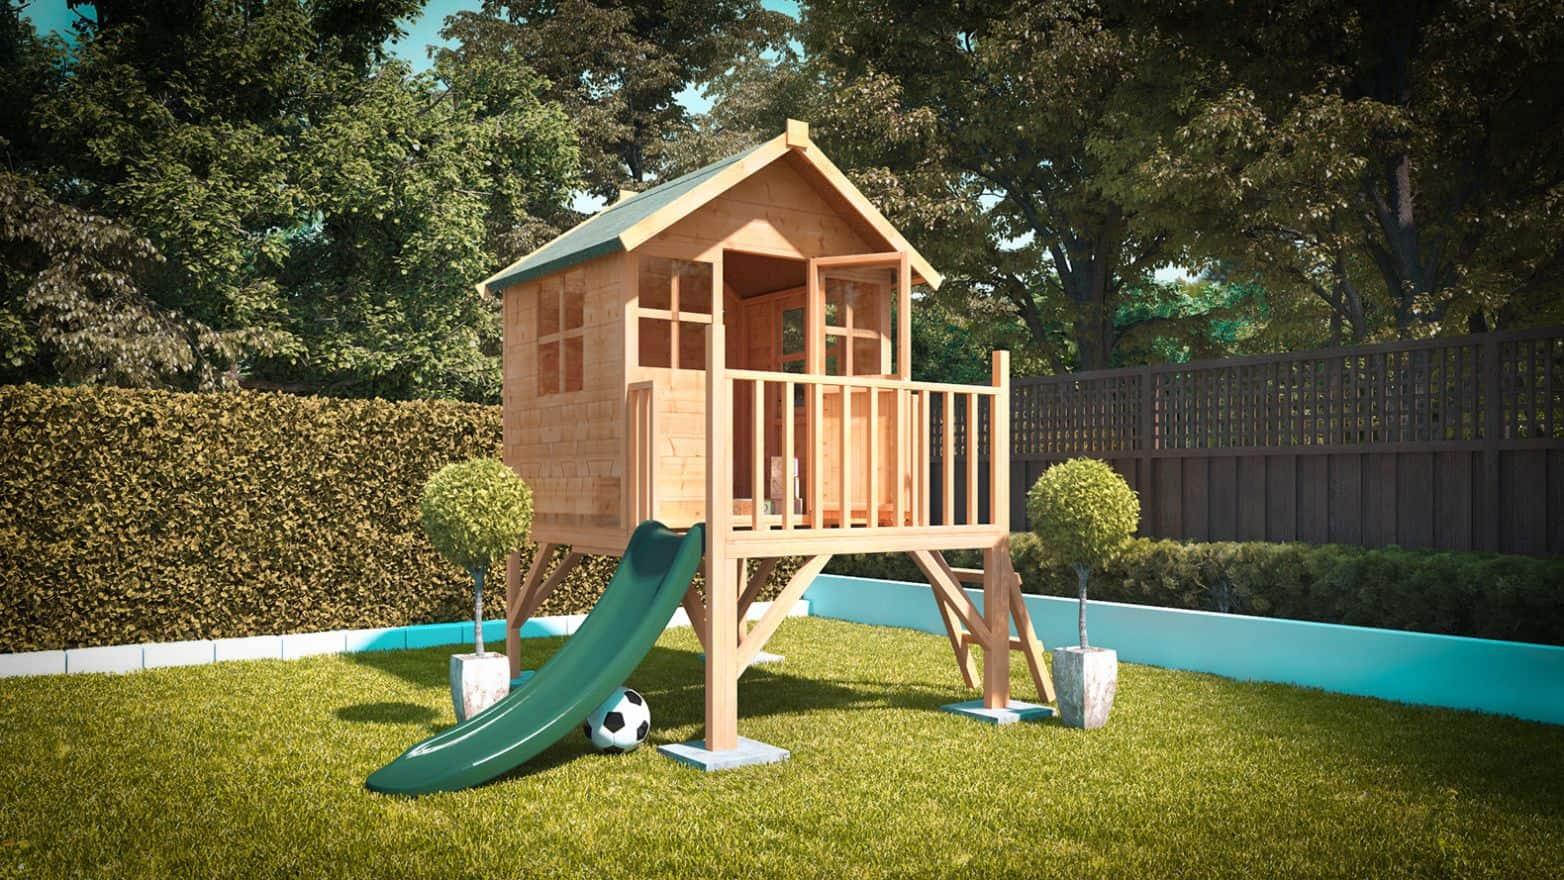 Choosing the right playhouse